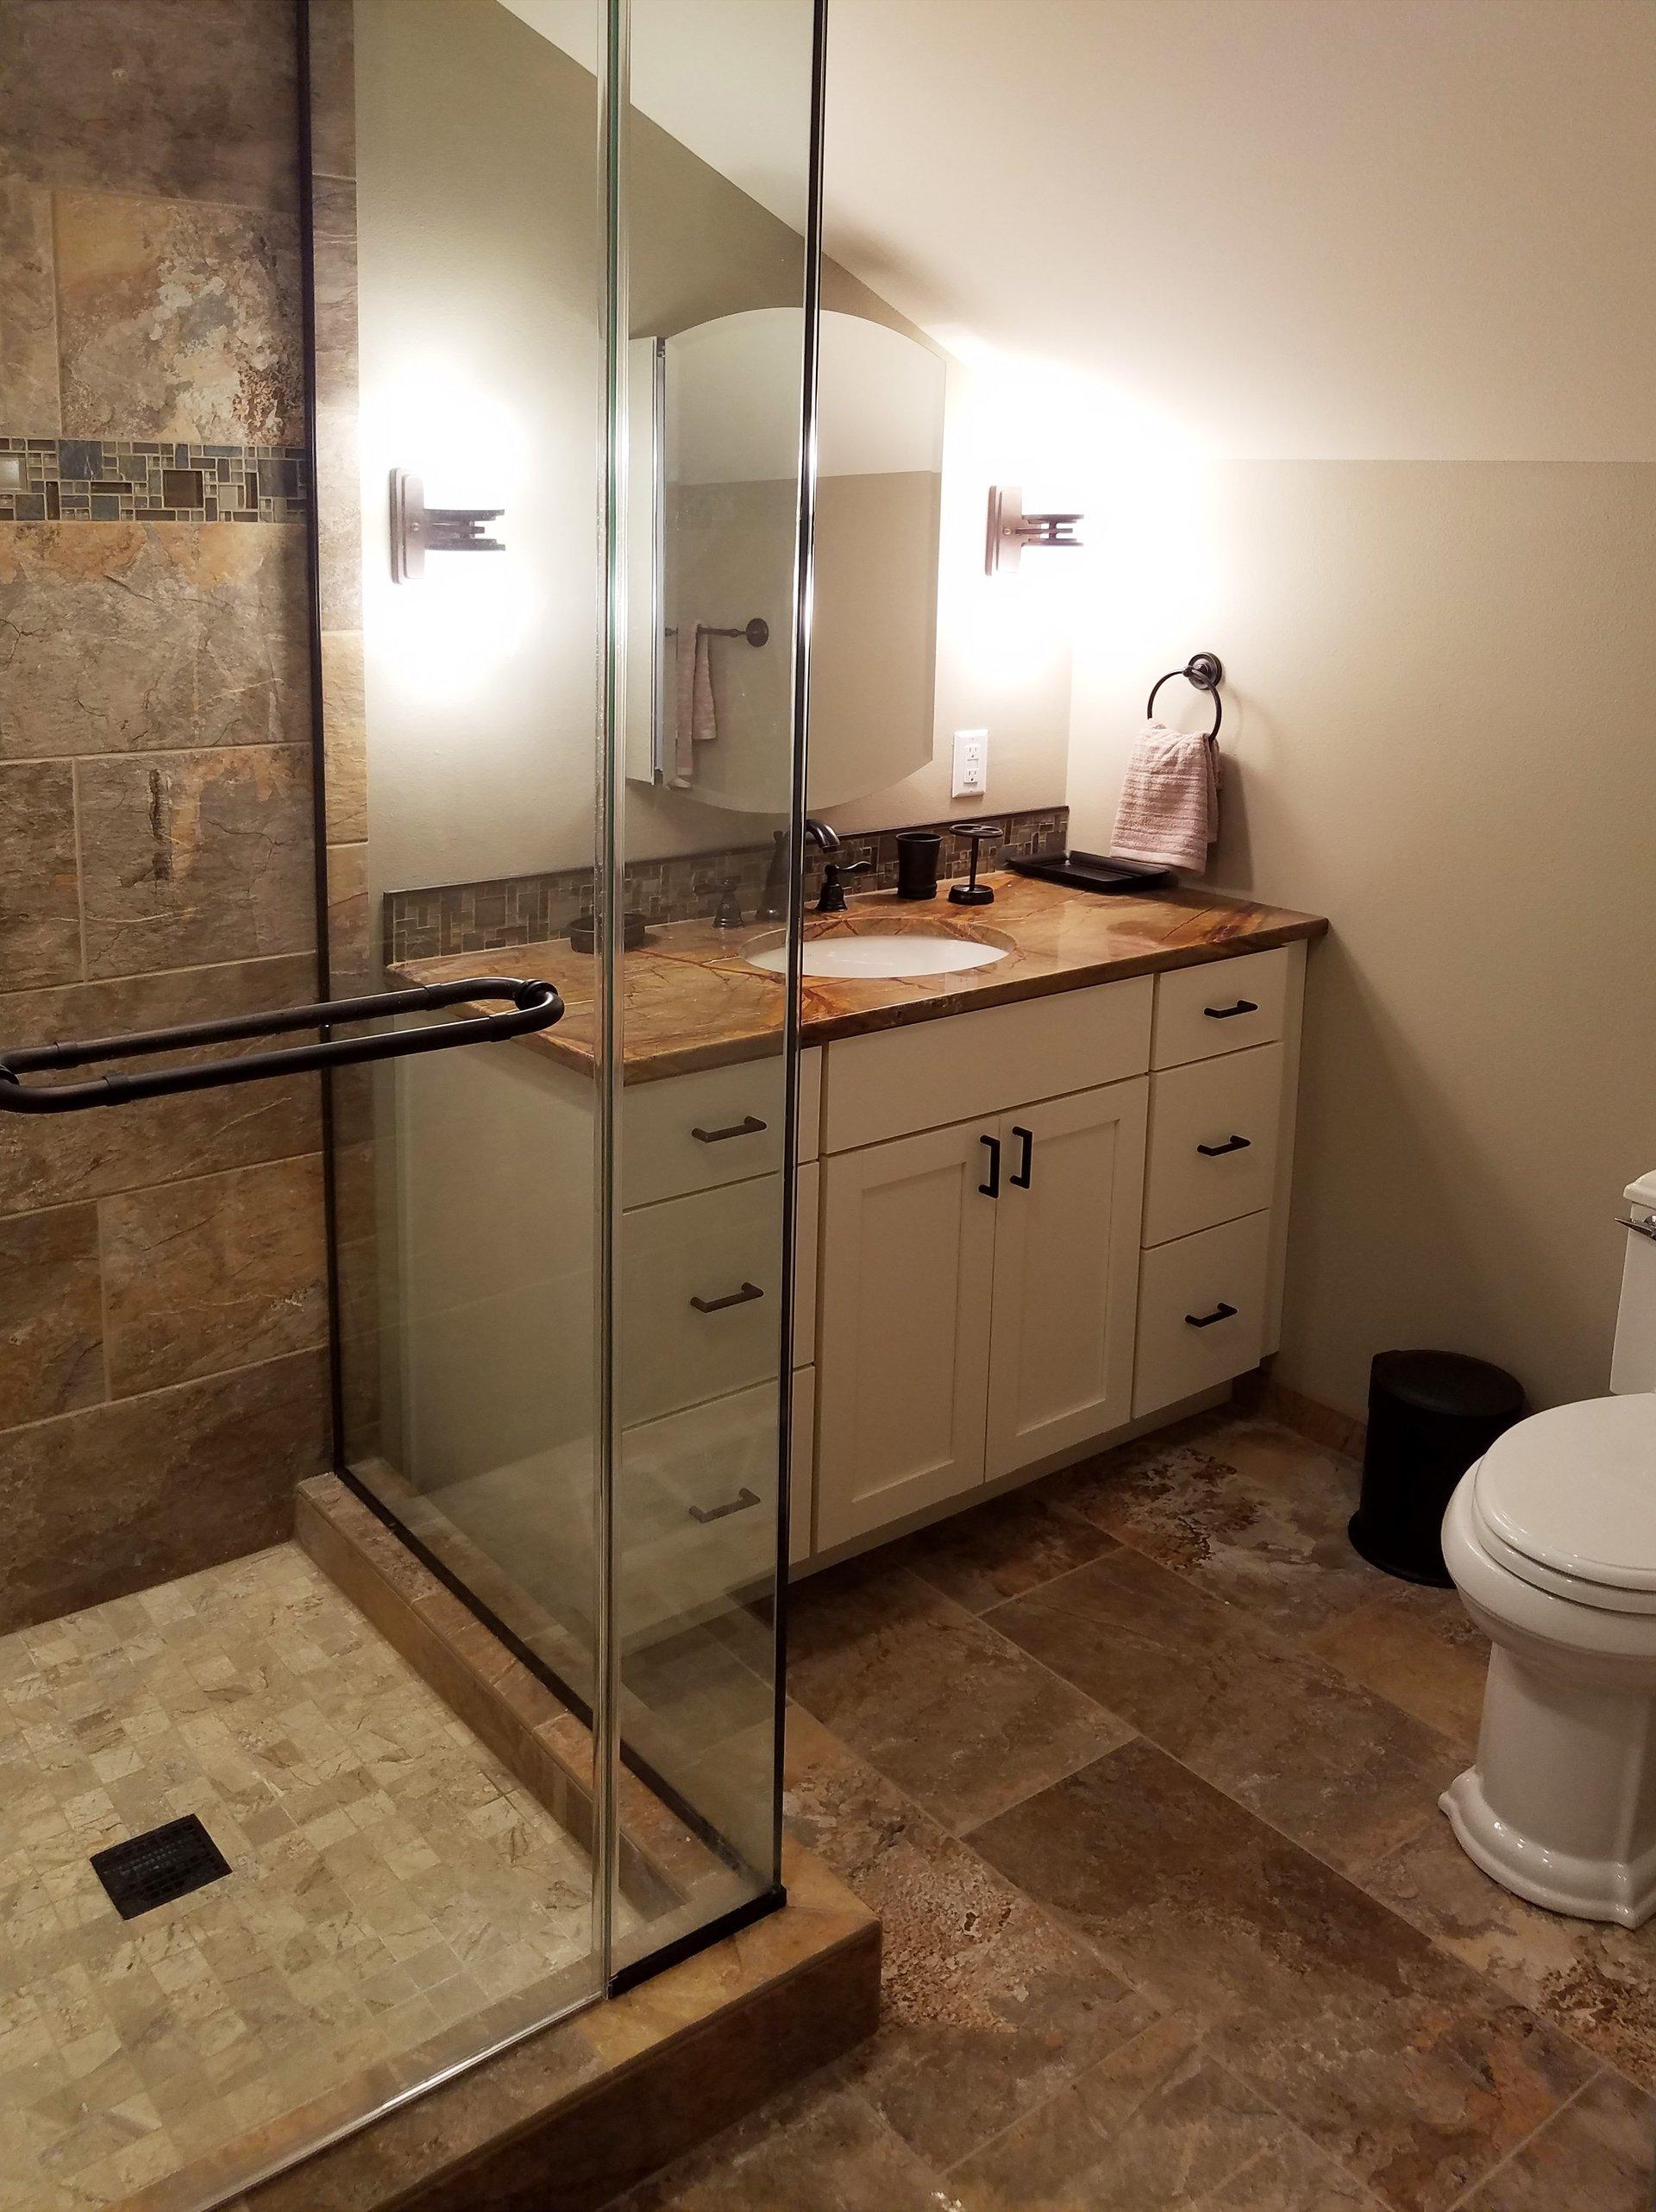 Bathroom vanities madison wi - Small Bathroom Remodel In Madison Wi Corner Shower Slanted Ceiling Bathroom Design